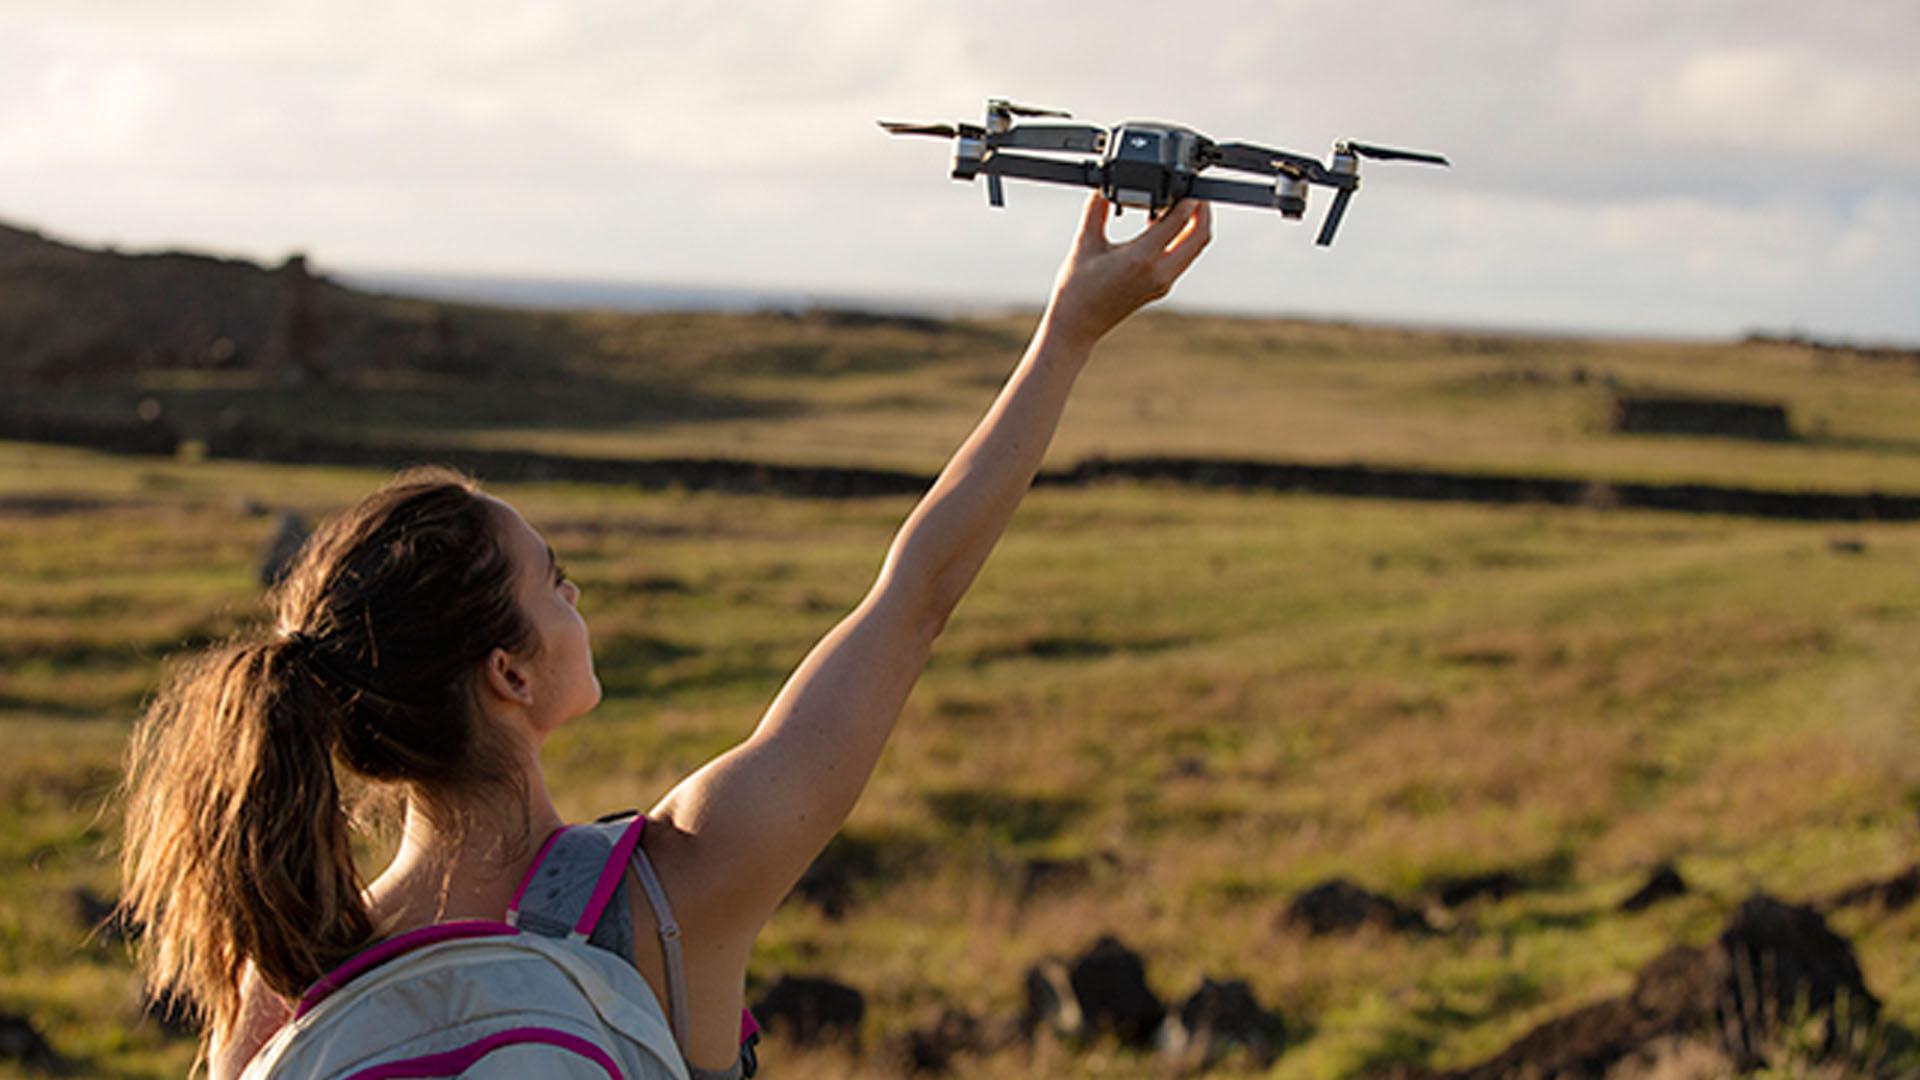 DJI Mavic Pro Compact Drone